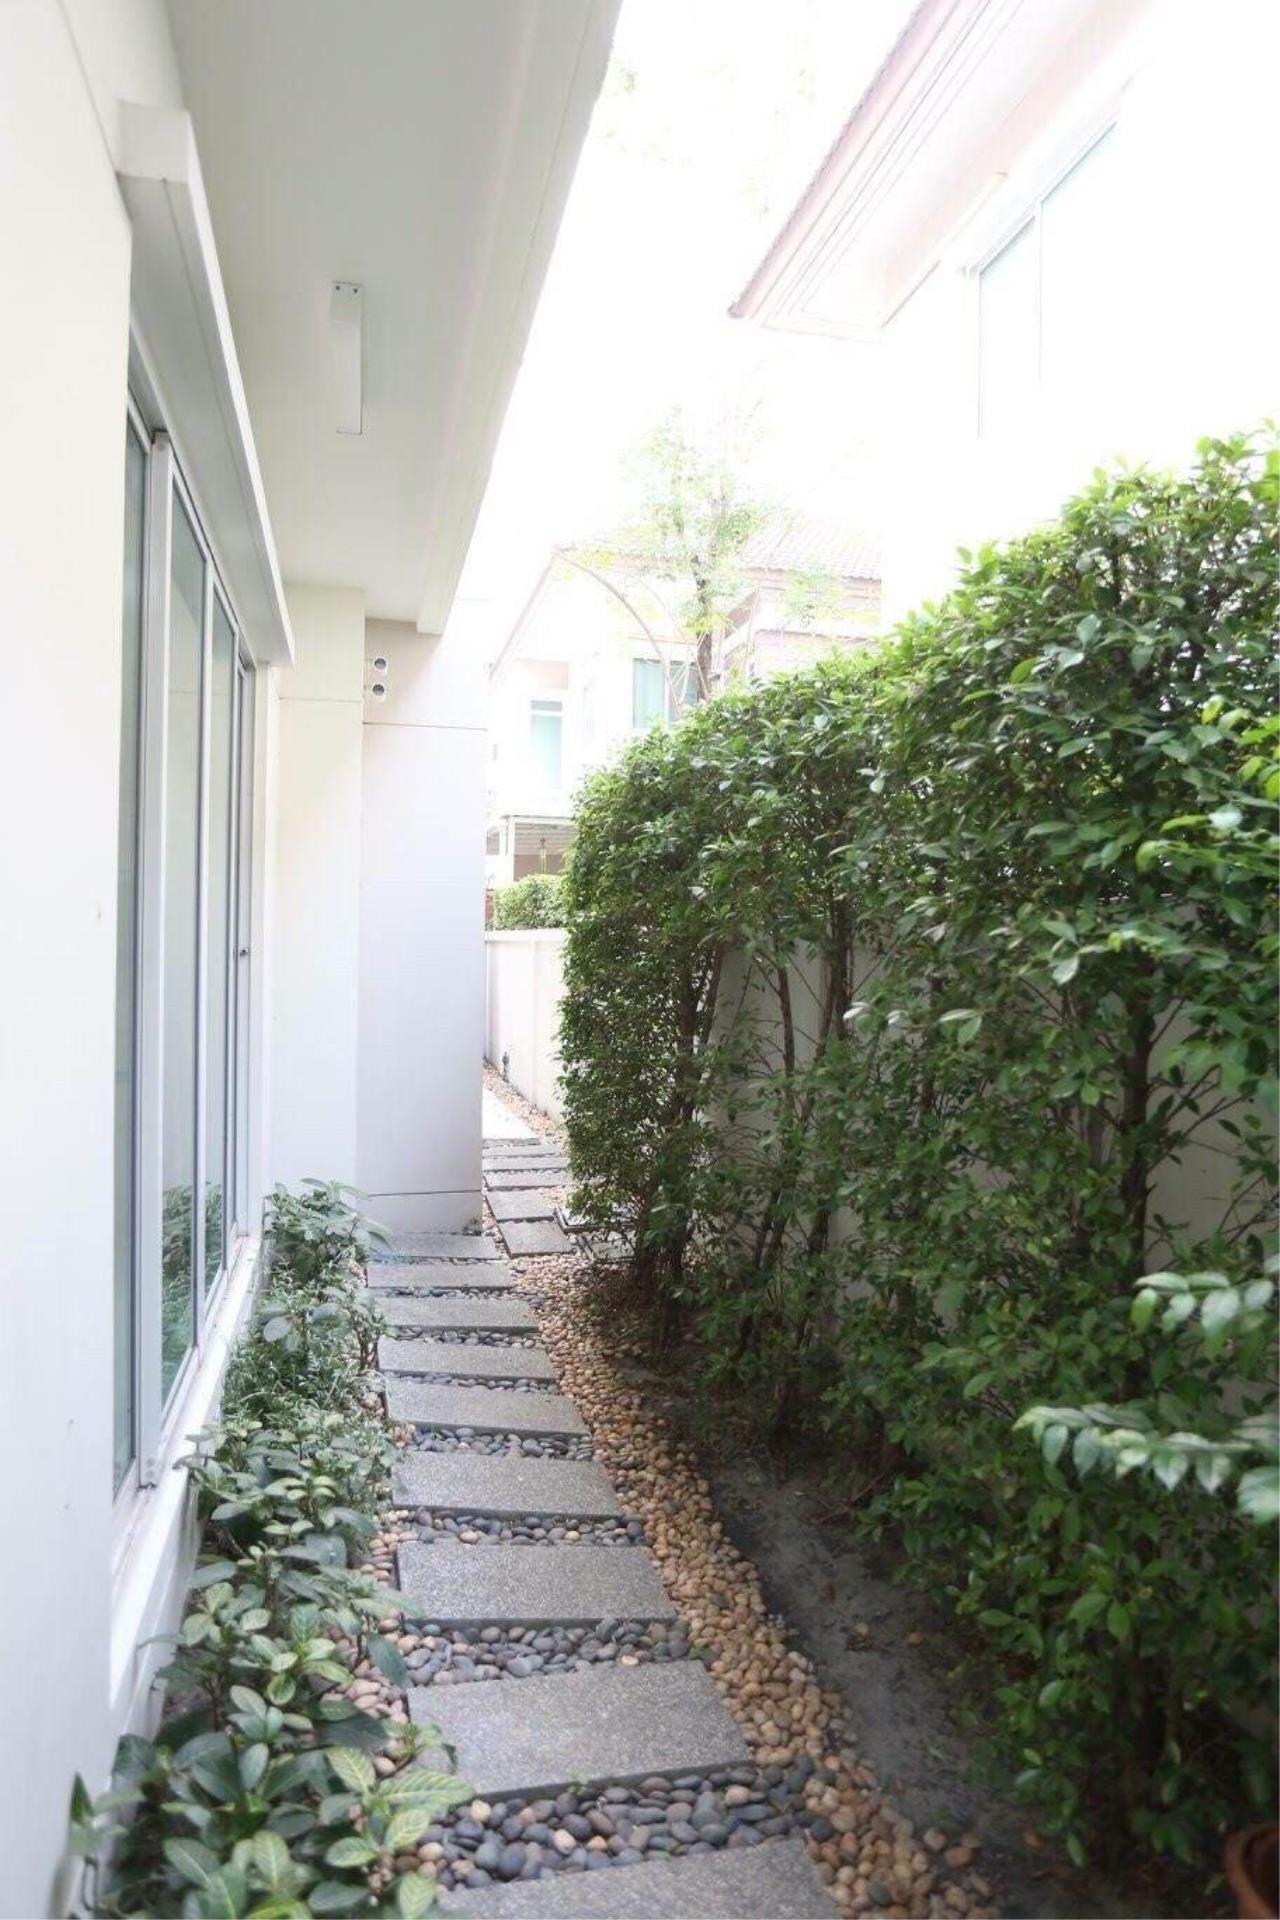 Uptown Assets  Agency's SALE House Bangkok Boulevard Rajapruk – Rama 5 (Project 2)  Sell Price 9.45  Unit 131/52 17